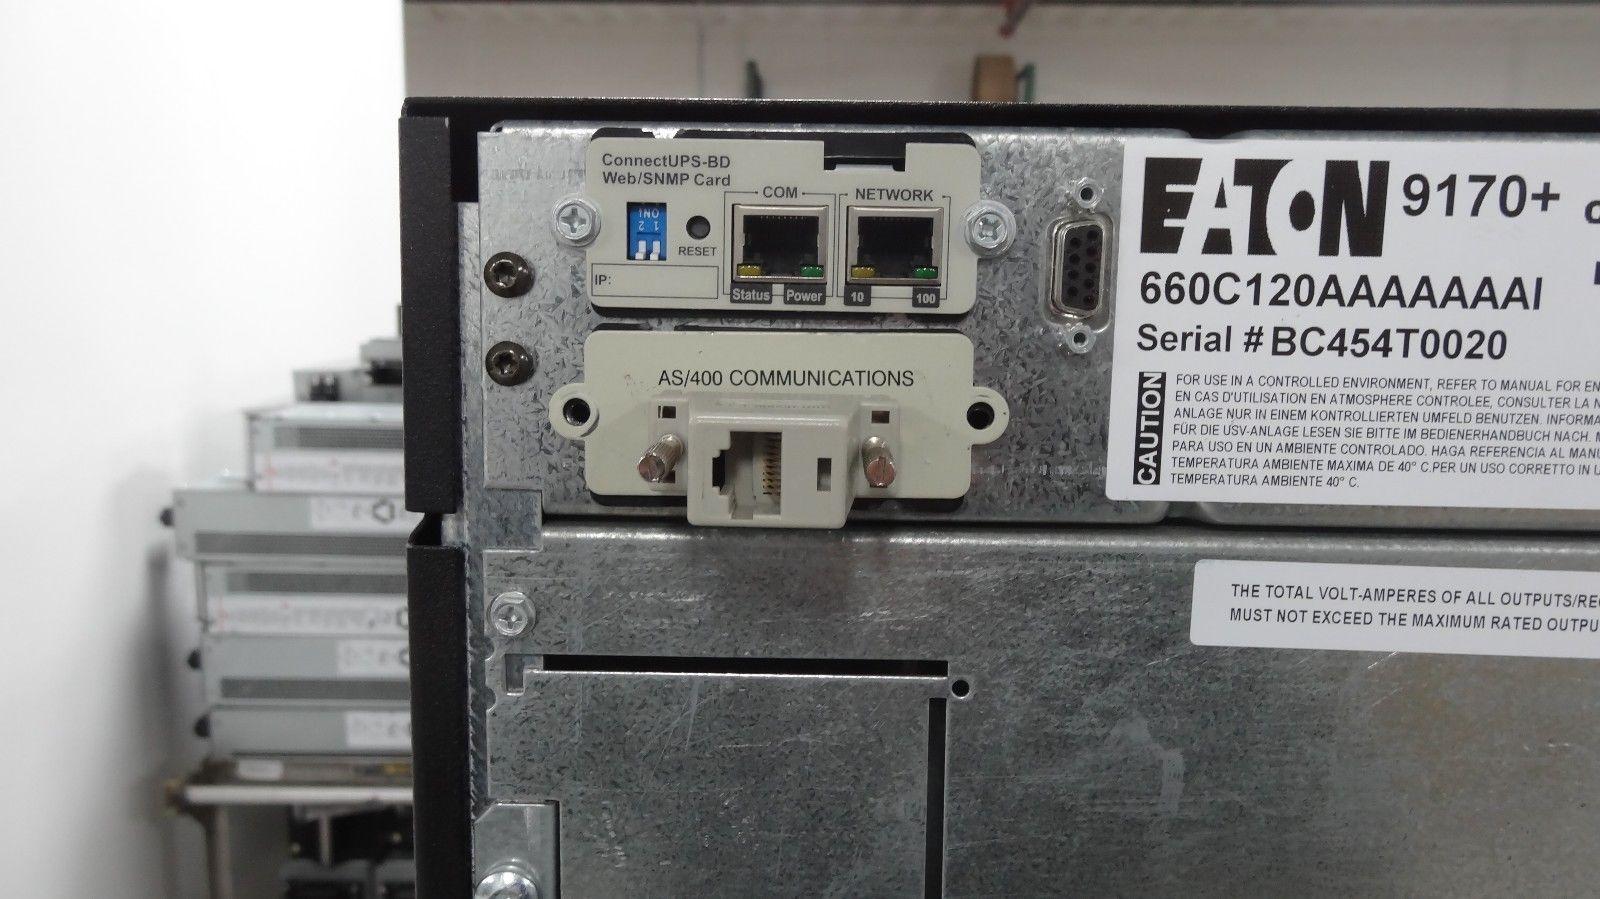 2009 Eaton 9170+ PW12S9K-PD 9KVA Expandable and 50 similar items on